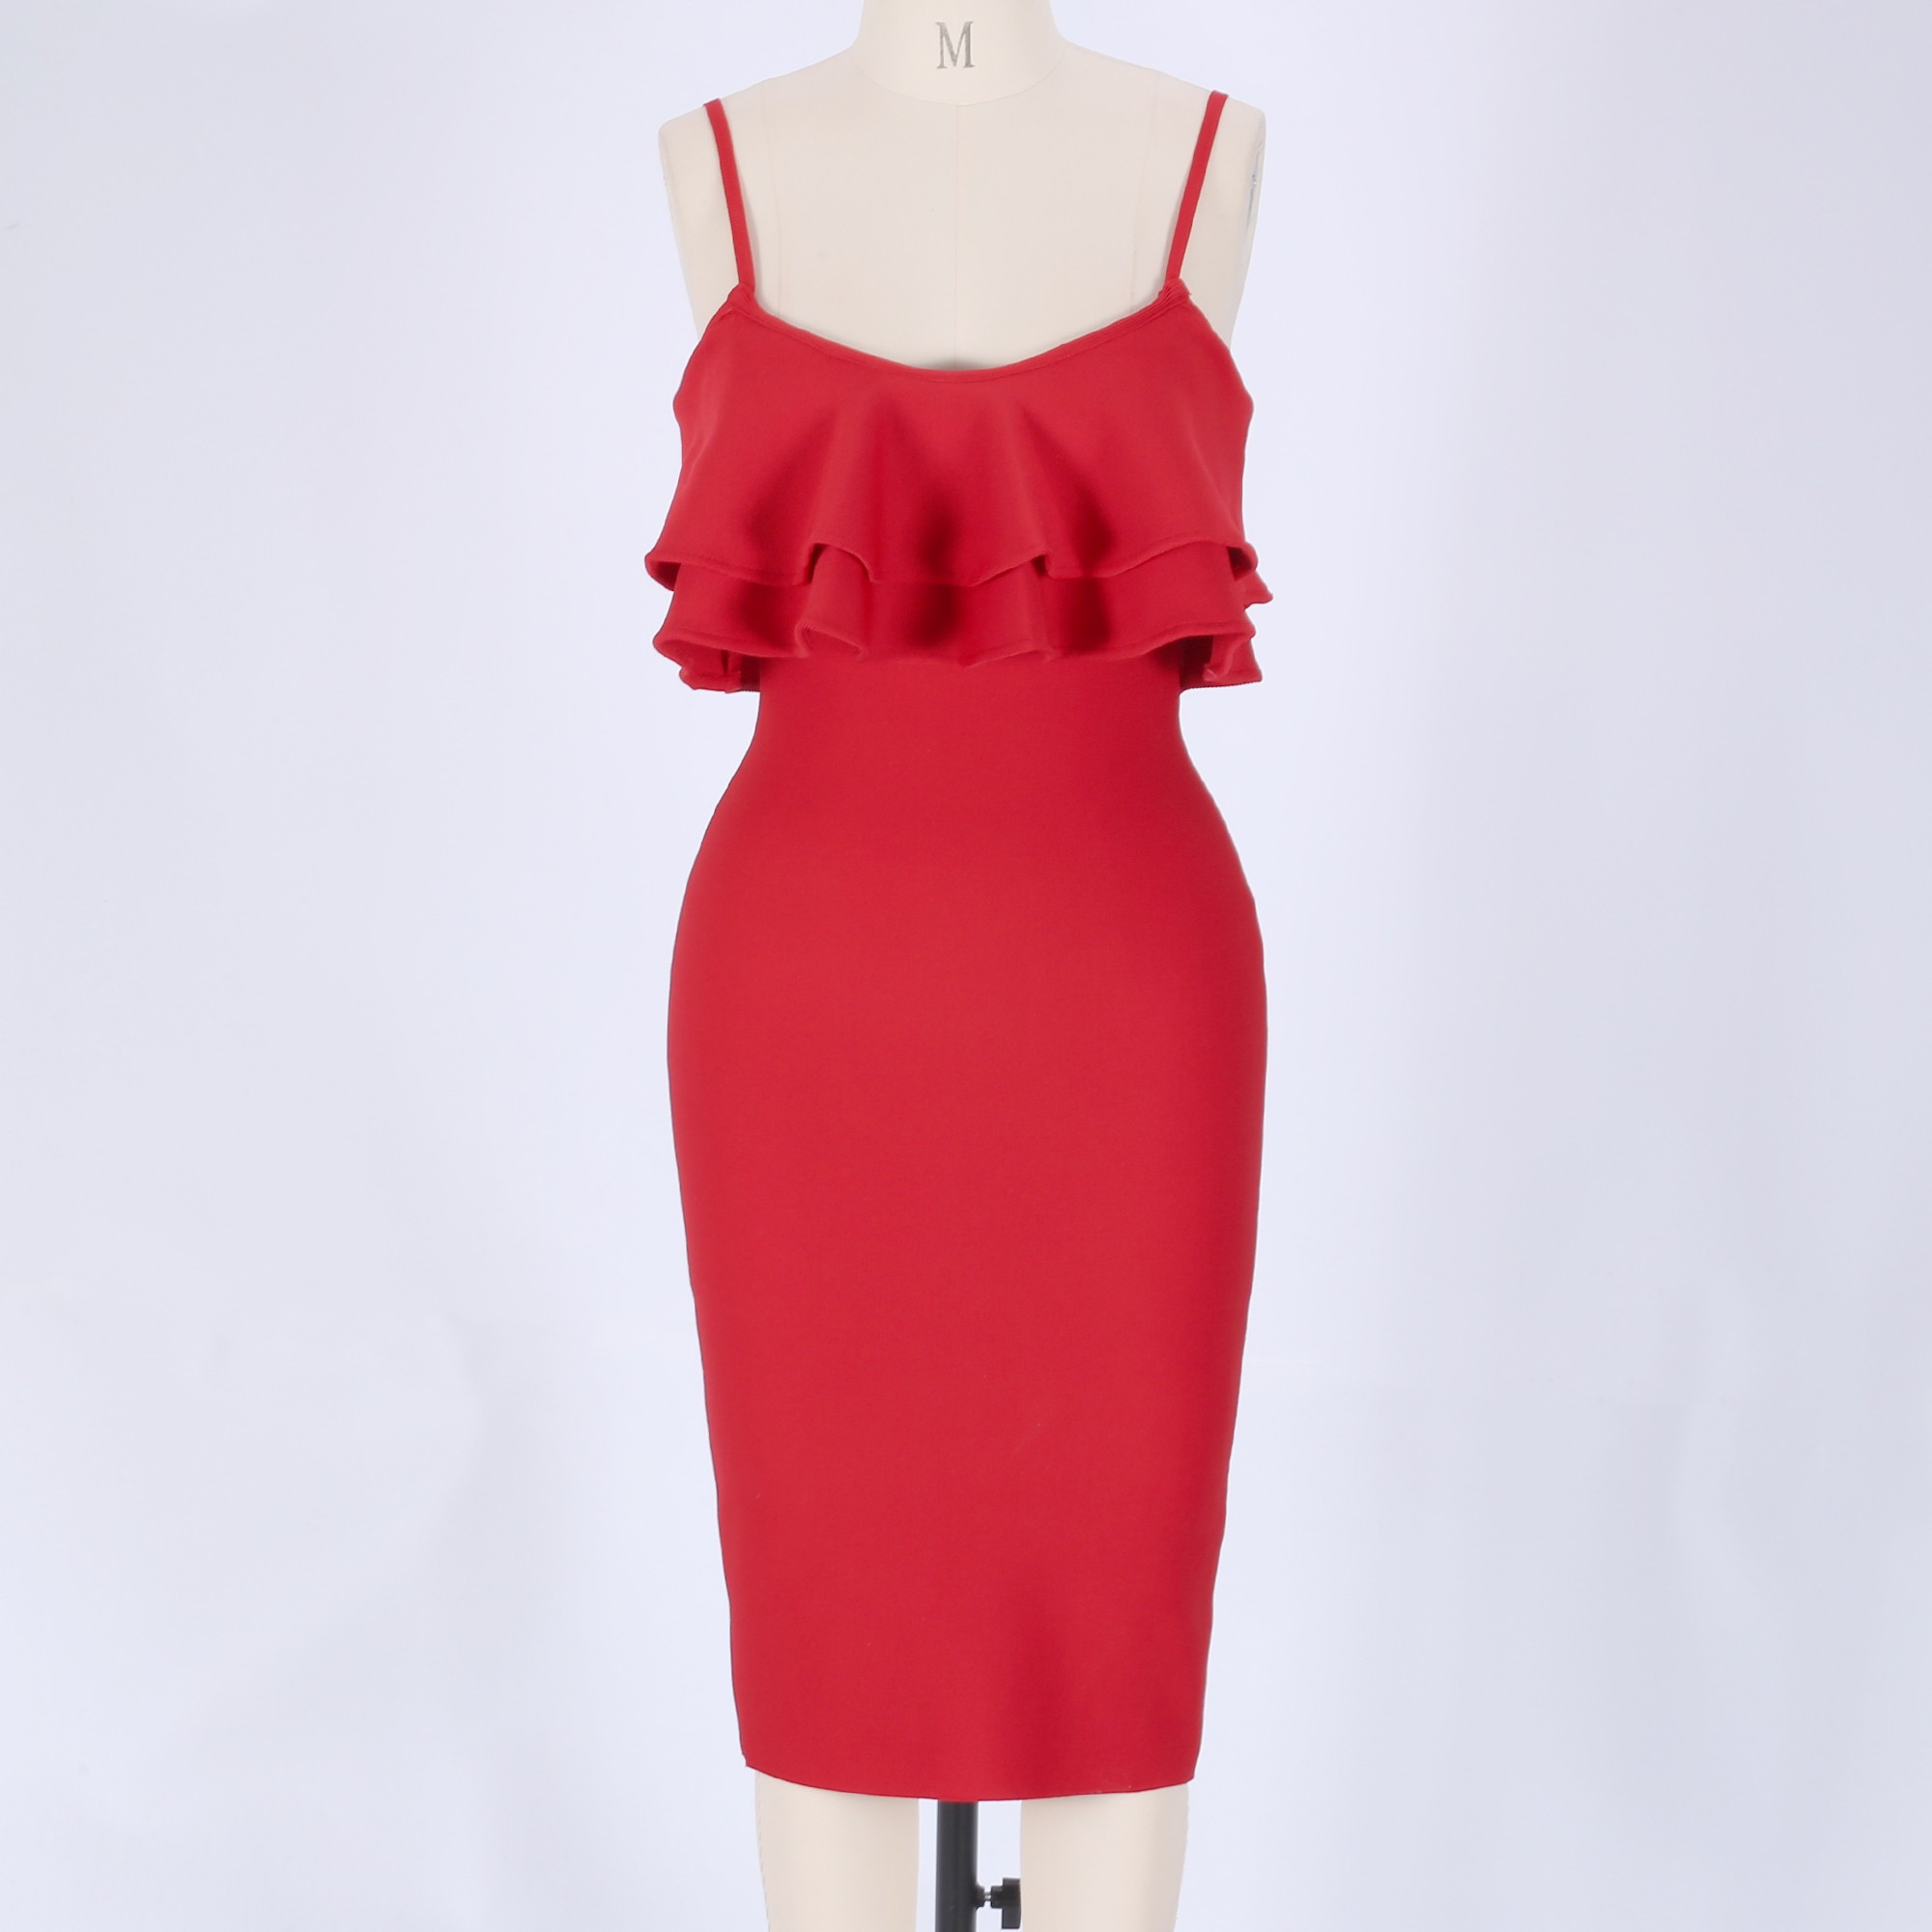 Red Strapy Off Shoulder Over Knee Scolloped Sleeves Back Slitted Fashion Bandage Dress HB5404-Red